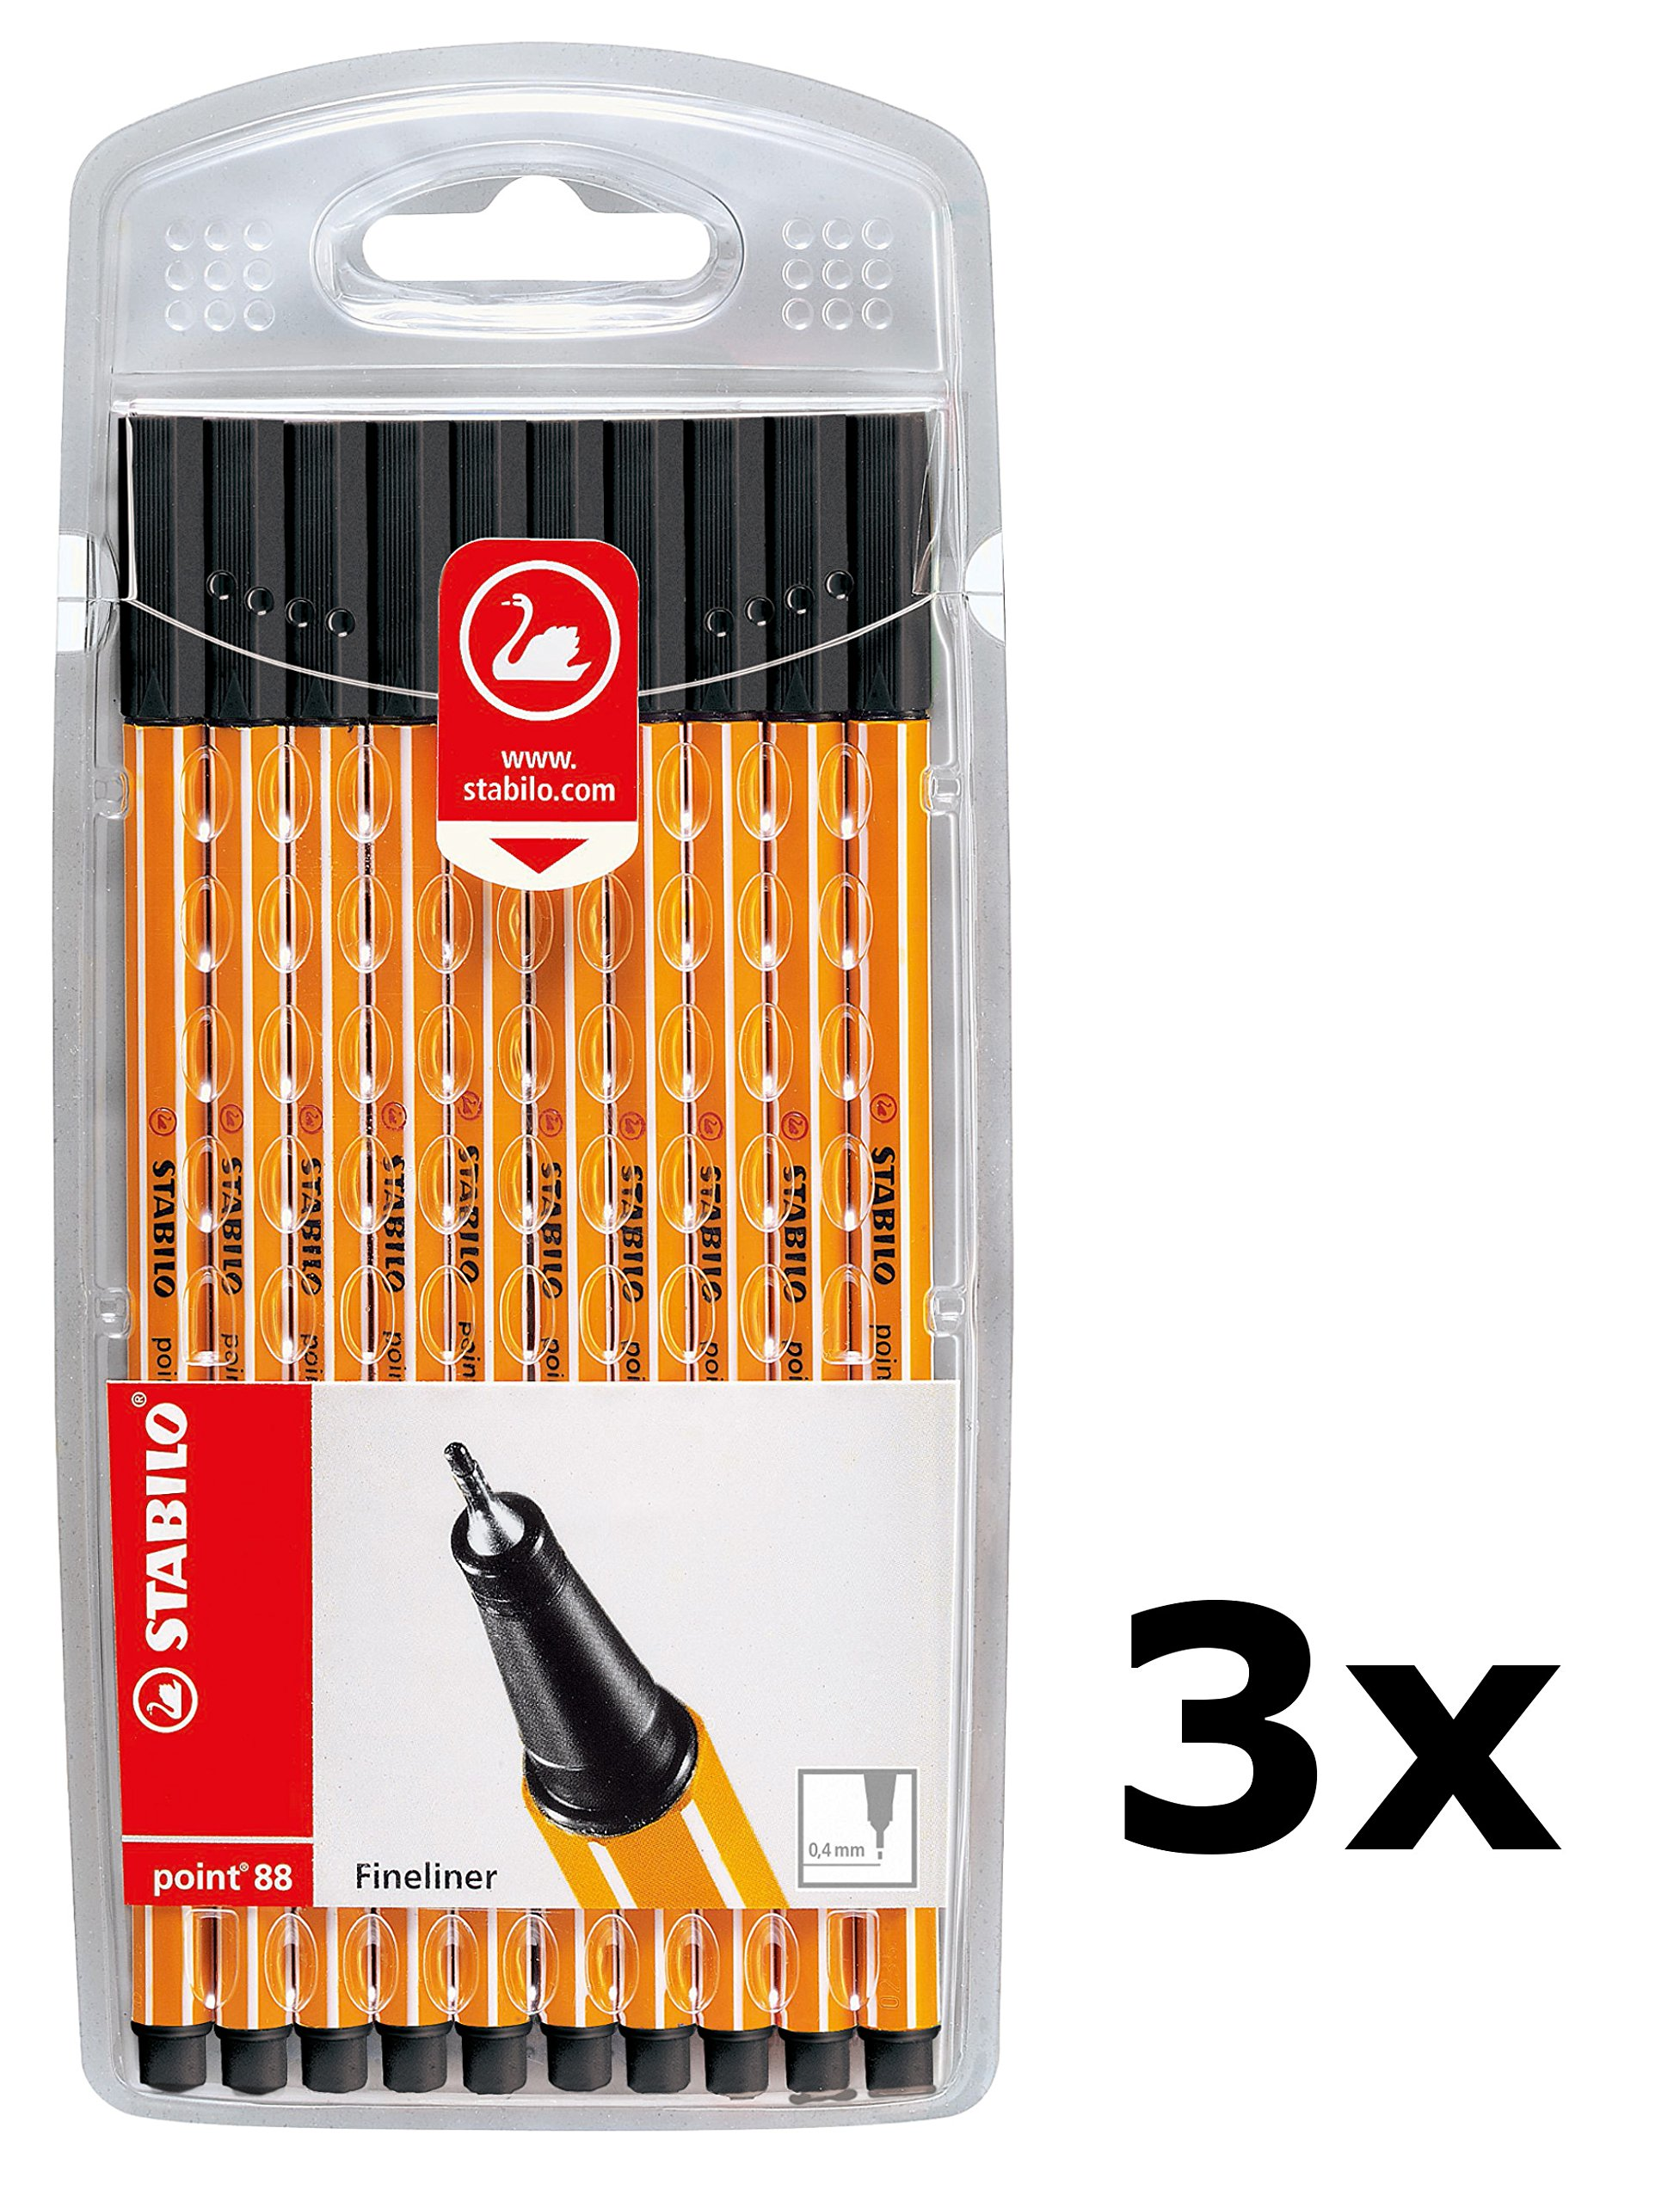 Fineliner STABILO point 88 (3 x 10 Pack) (Negro): Amazon.es ...